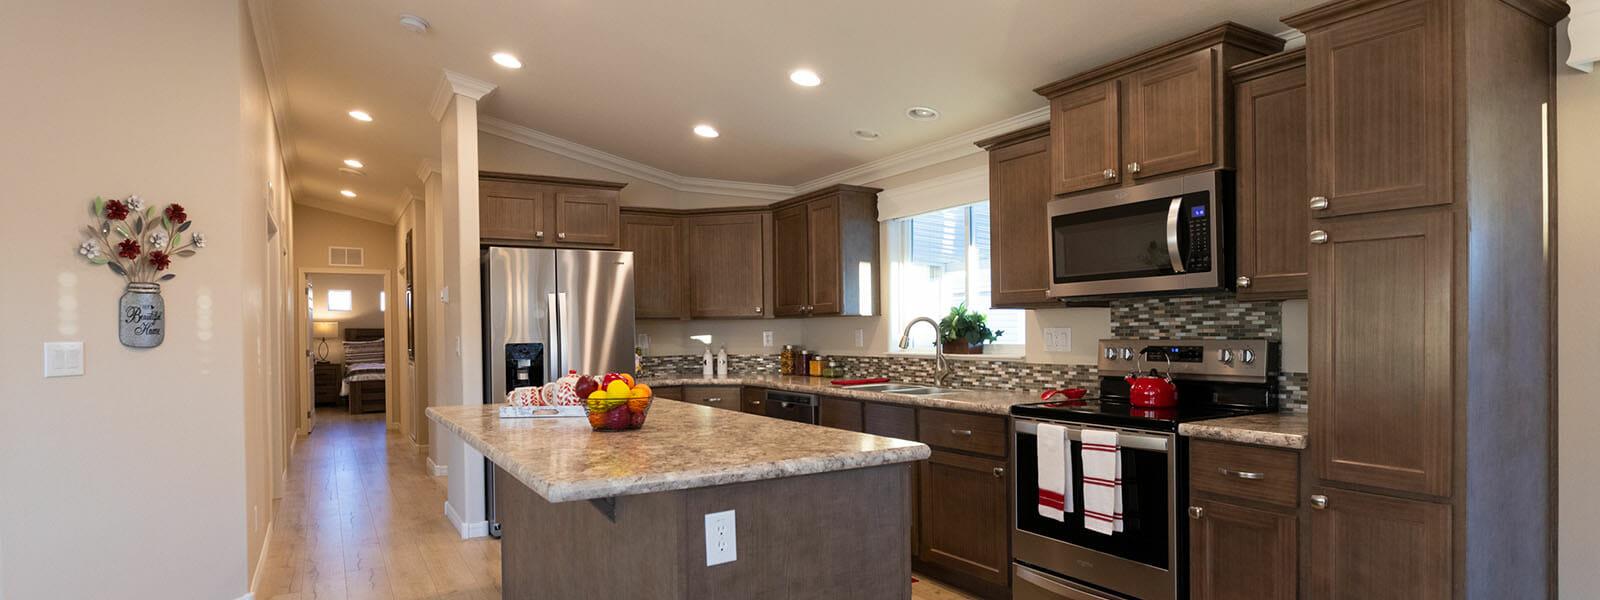 Las Palmas Grand | Arizona Active 55 Resort Community | AZ Real Estate